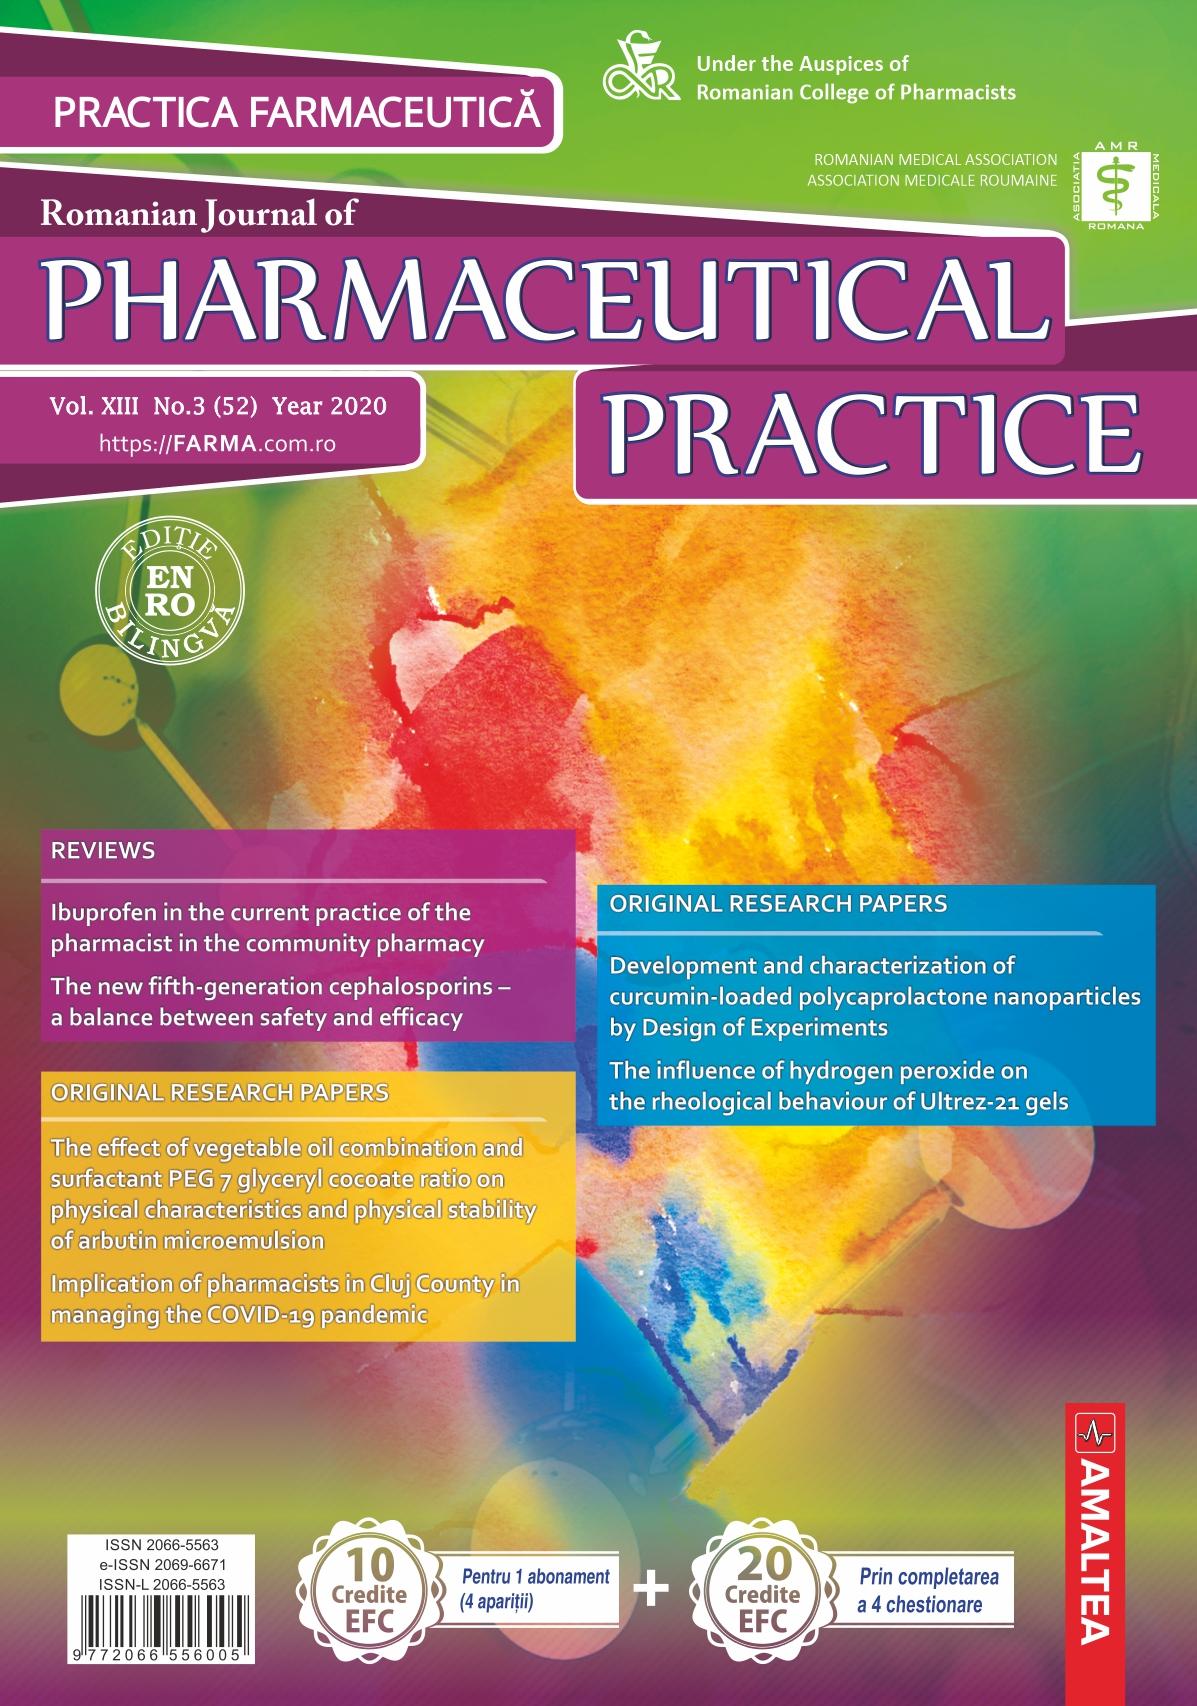 Romanian Journal of Pharmaceutical Practice - Practica Farmaceutica, Vol. XIII, No. 3 (52), 2020